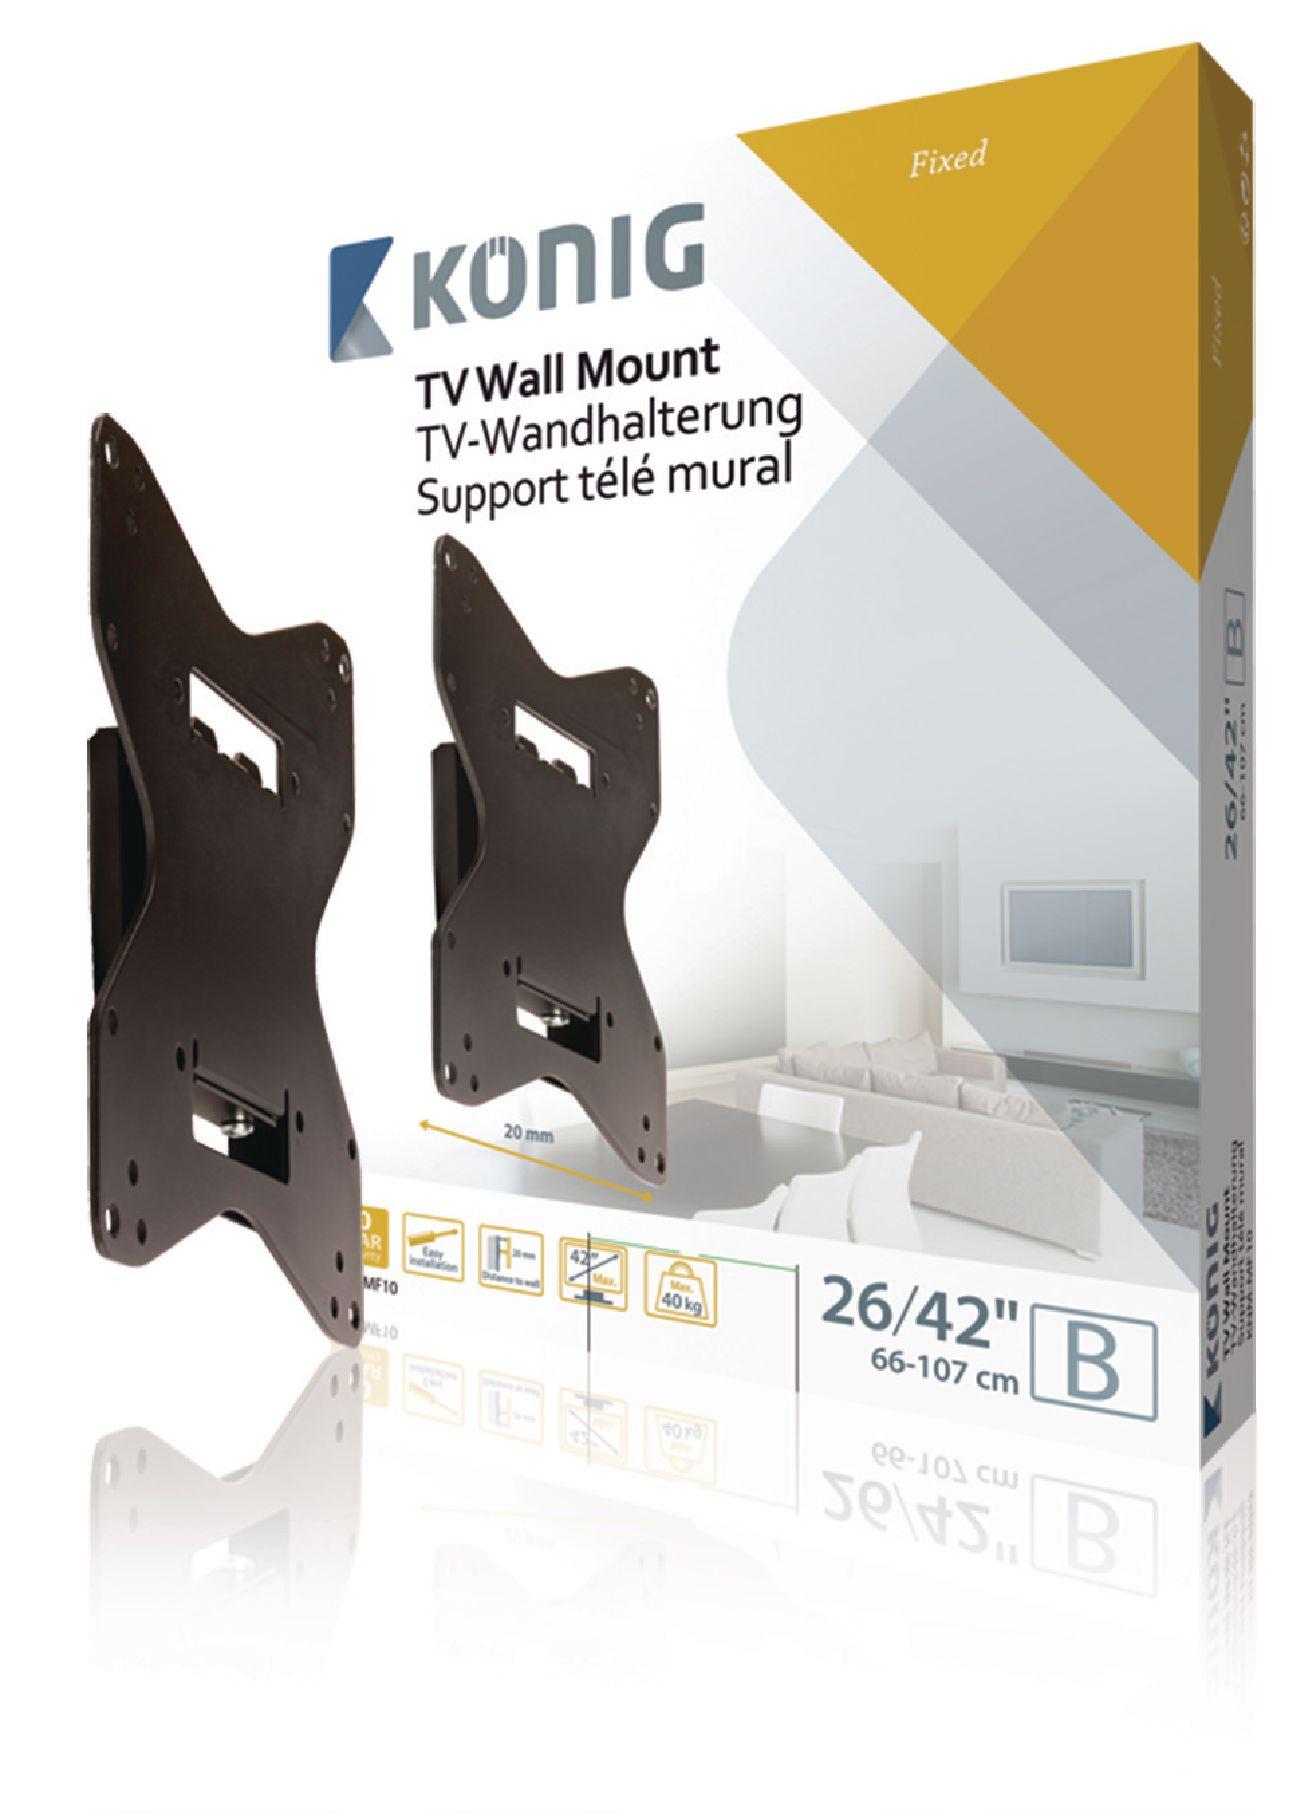 KNM-MF10 - König - TV Wall Mount Fixed 26 - 42